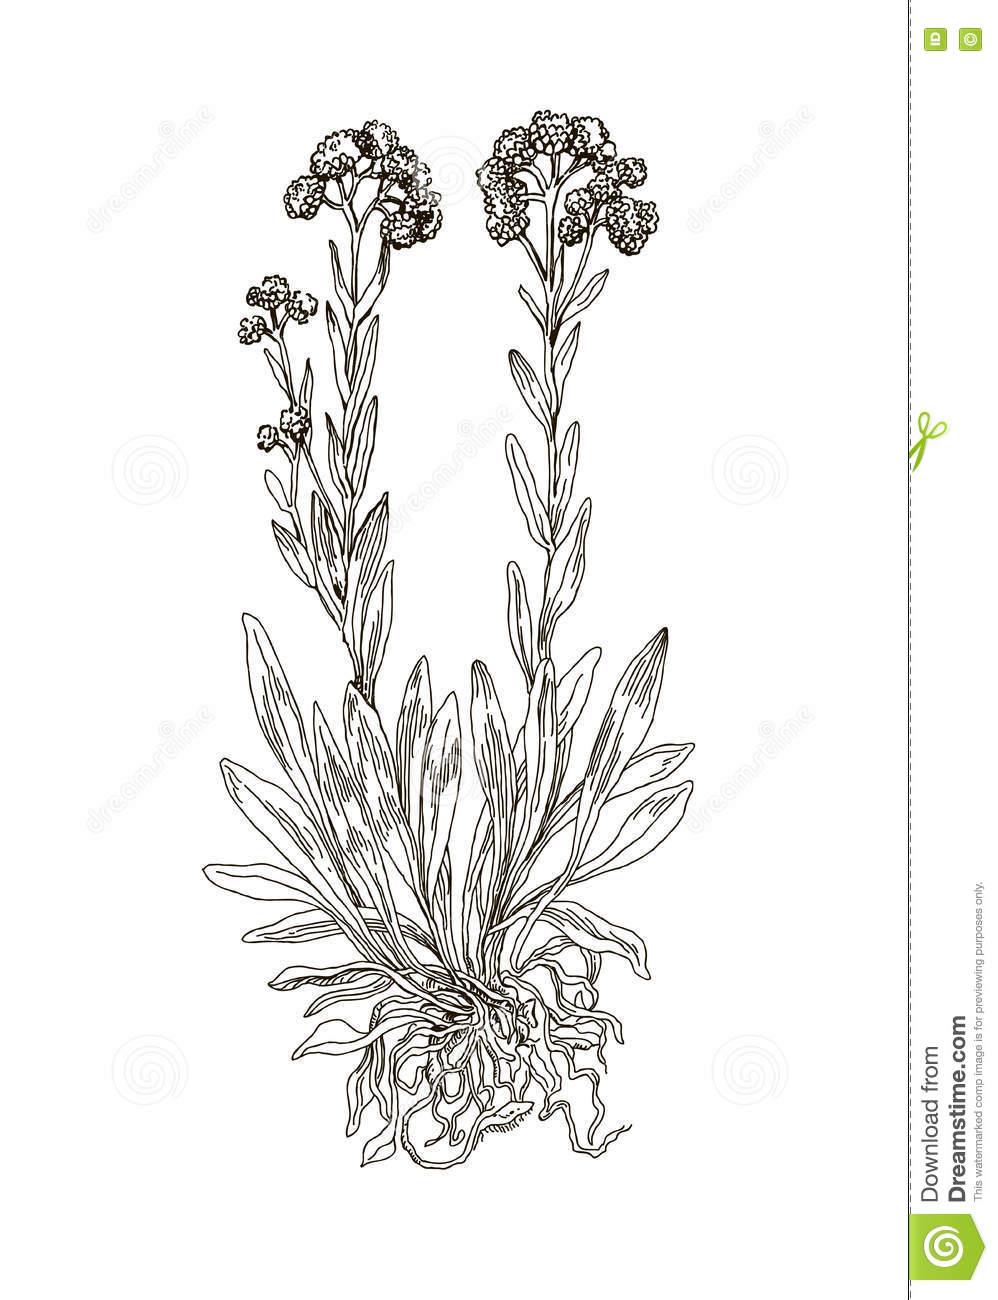 Helichrysum Arenarium. Handdrawn Illustration. Health And Nature.